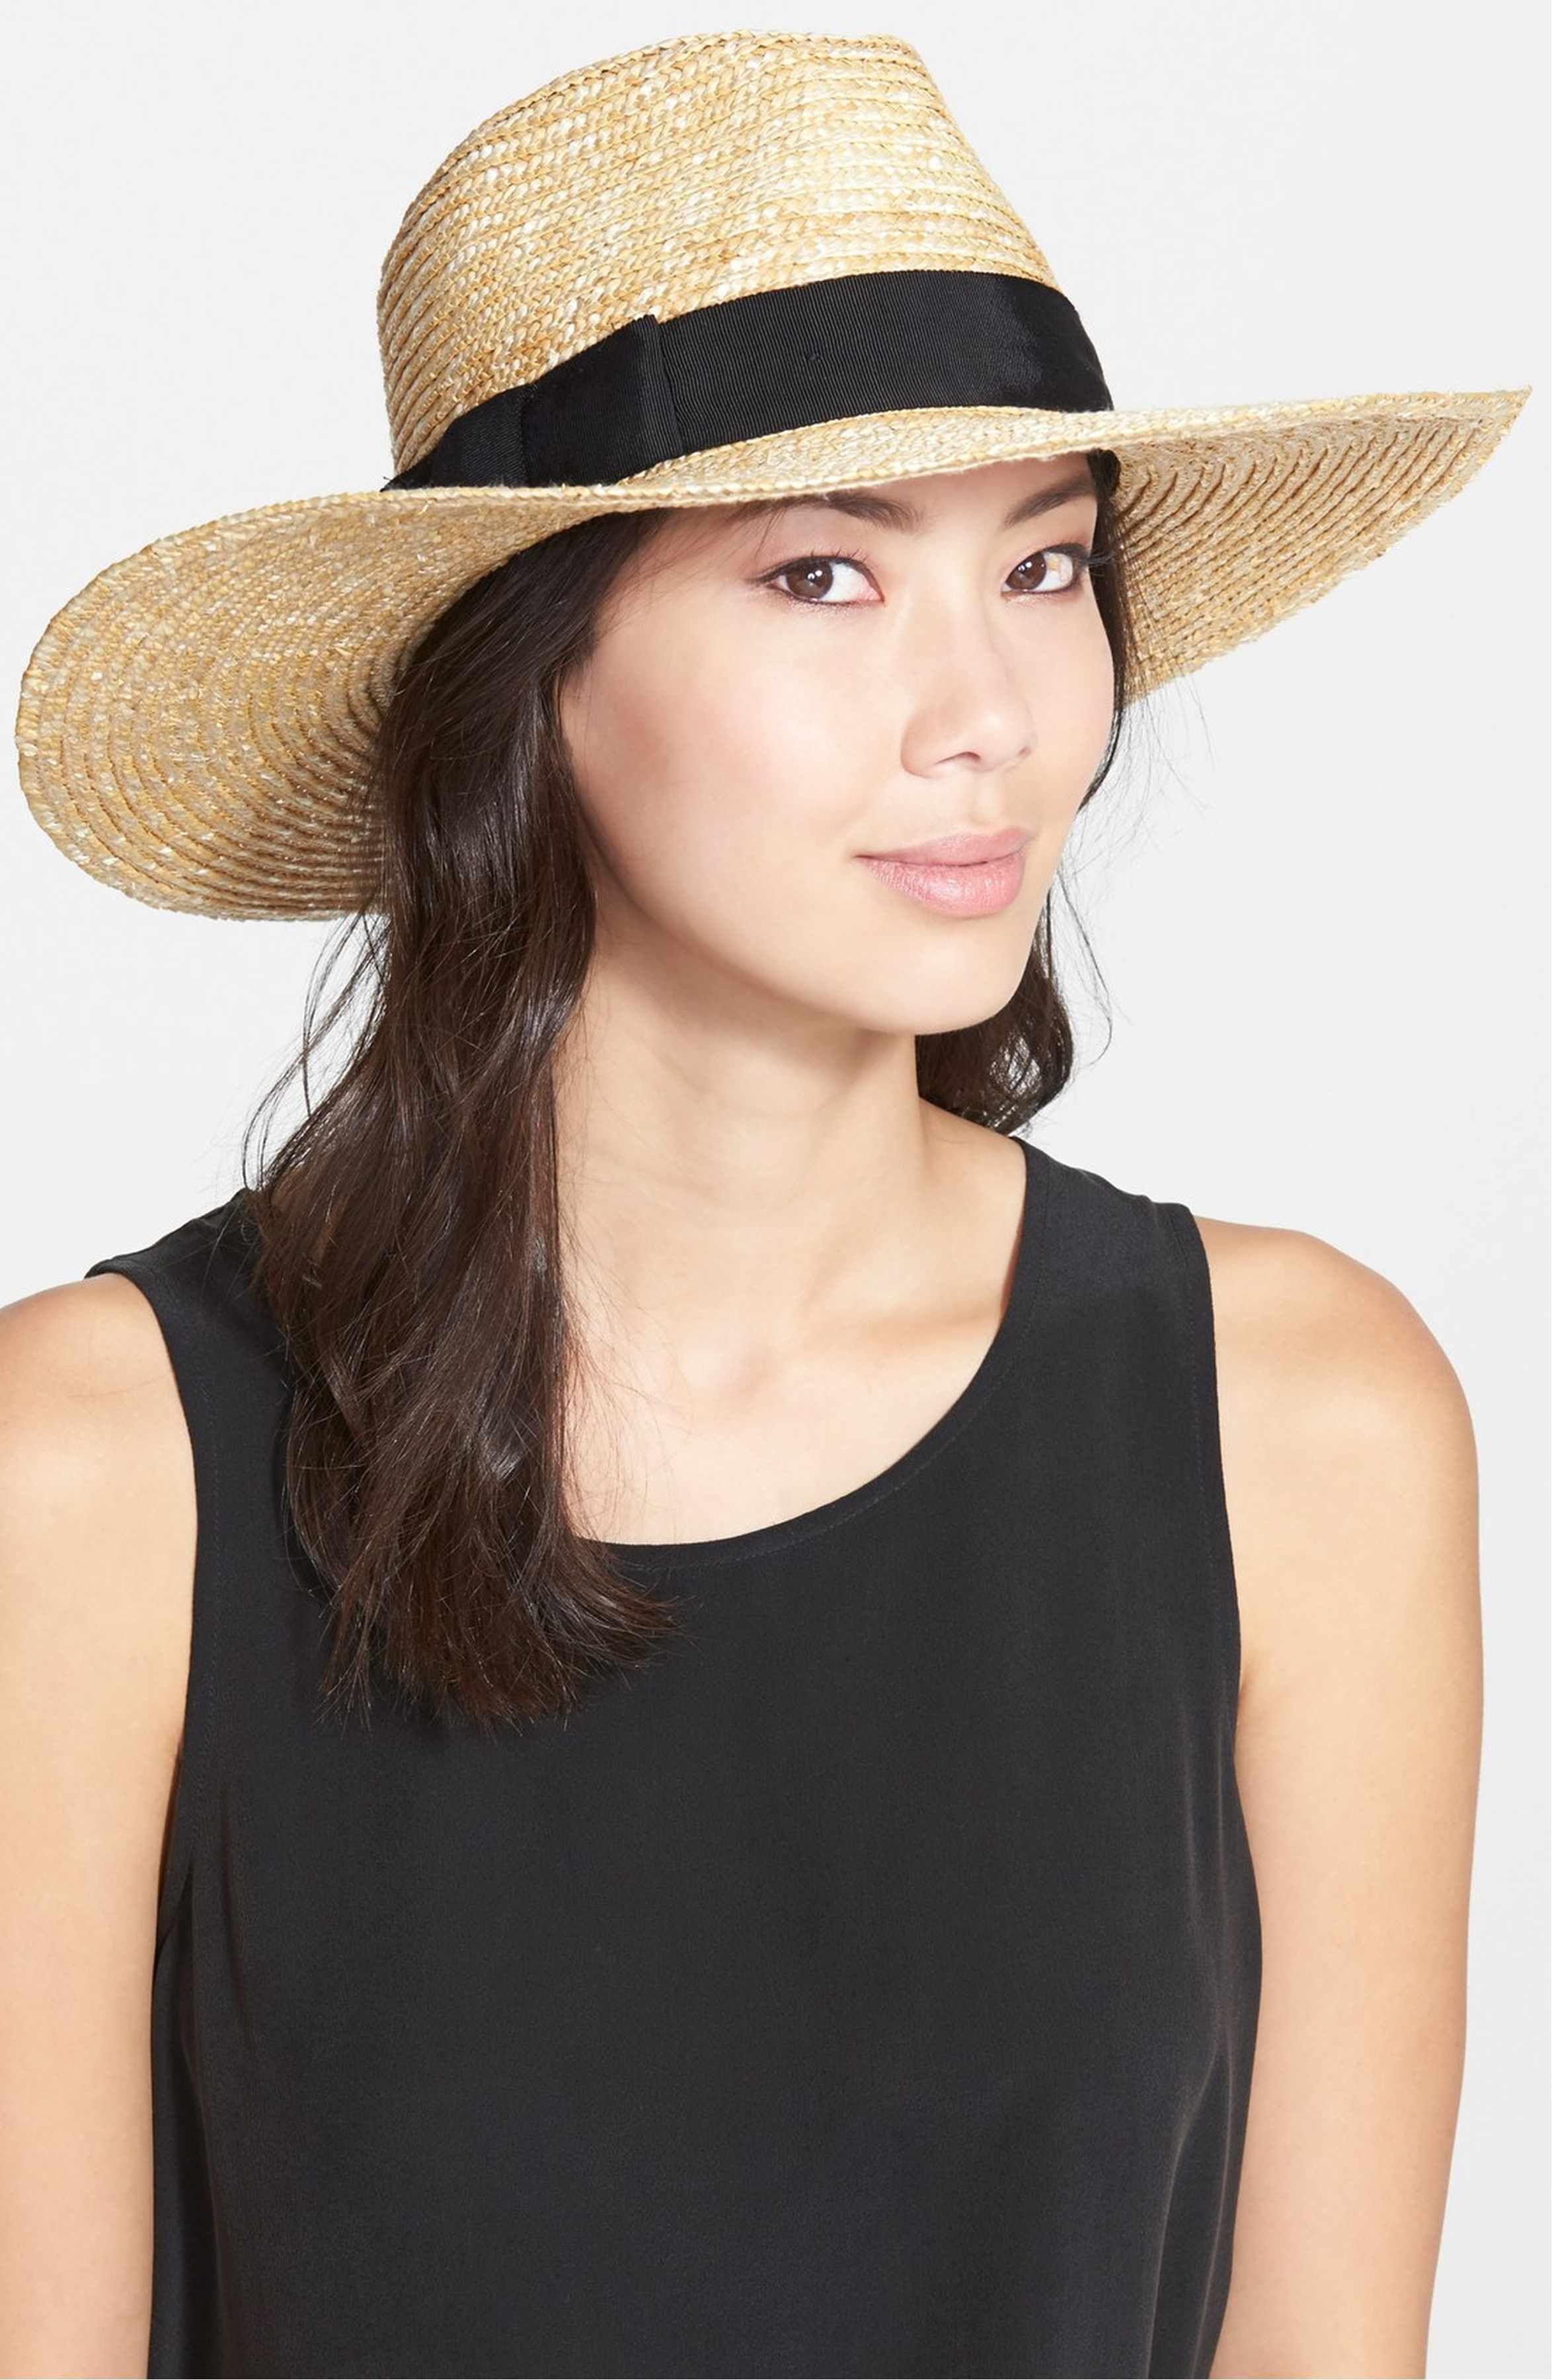 Brixton Joanna Straw Hat Hats For Women Straw Hat Fashion